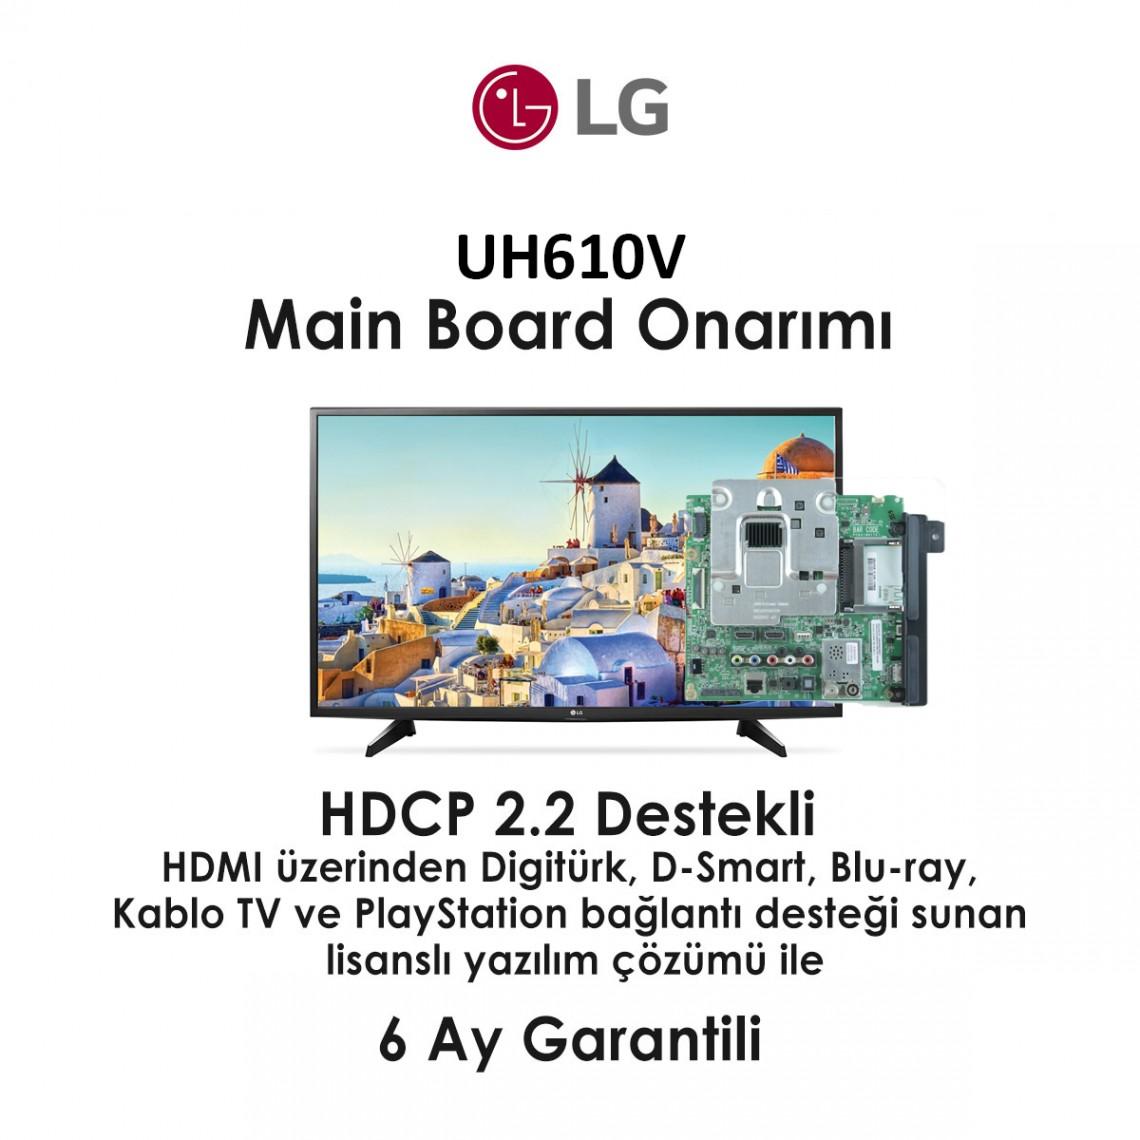 UD65S, EAX66943504 (1.0), 43UH610V, 49UH610V, Main Board Onarımı